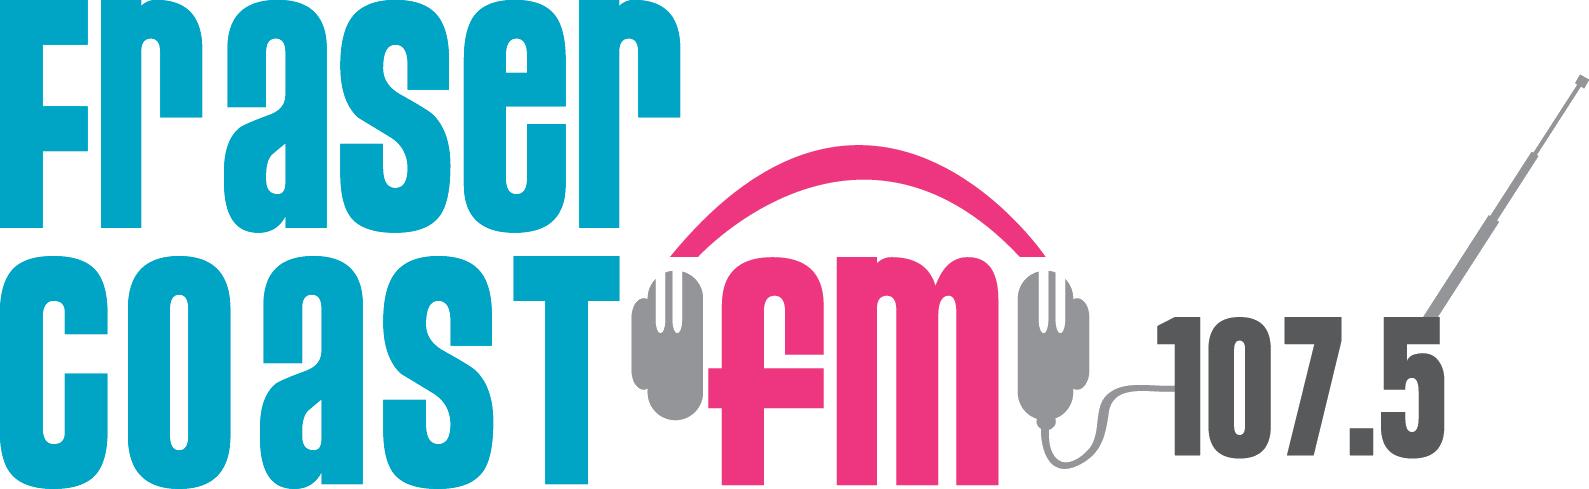 Fraser Coast FM 107.5